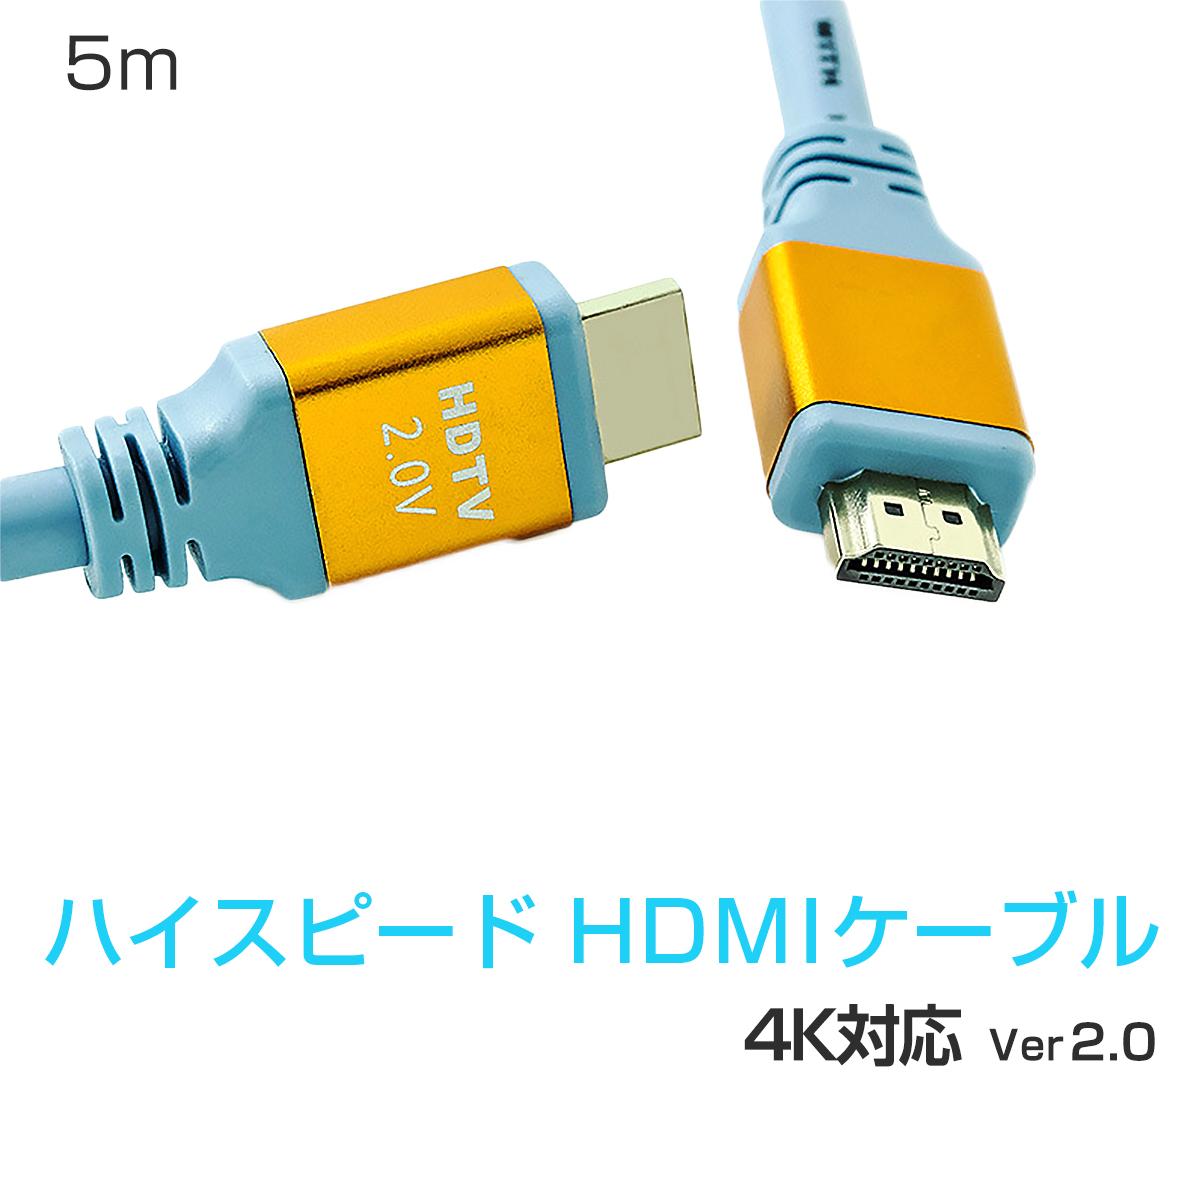 HDMIケーブル ハイスピード Ver2.0 4K/60p UltraHD HDR 3D FHD HEC ARC 5m ノイズキャンセラー付き タイプAオス-タイプAオス 青 SDM便送料無料 1ヶ月保証 K&M